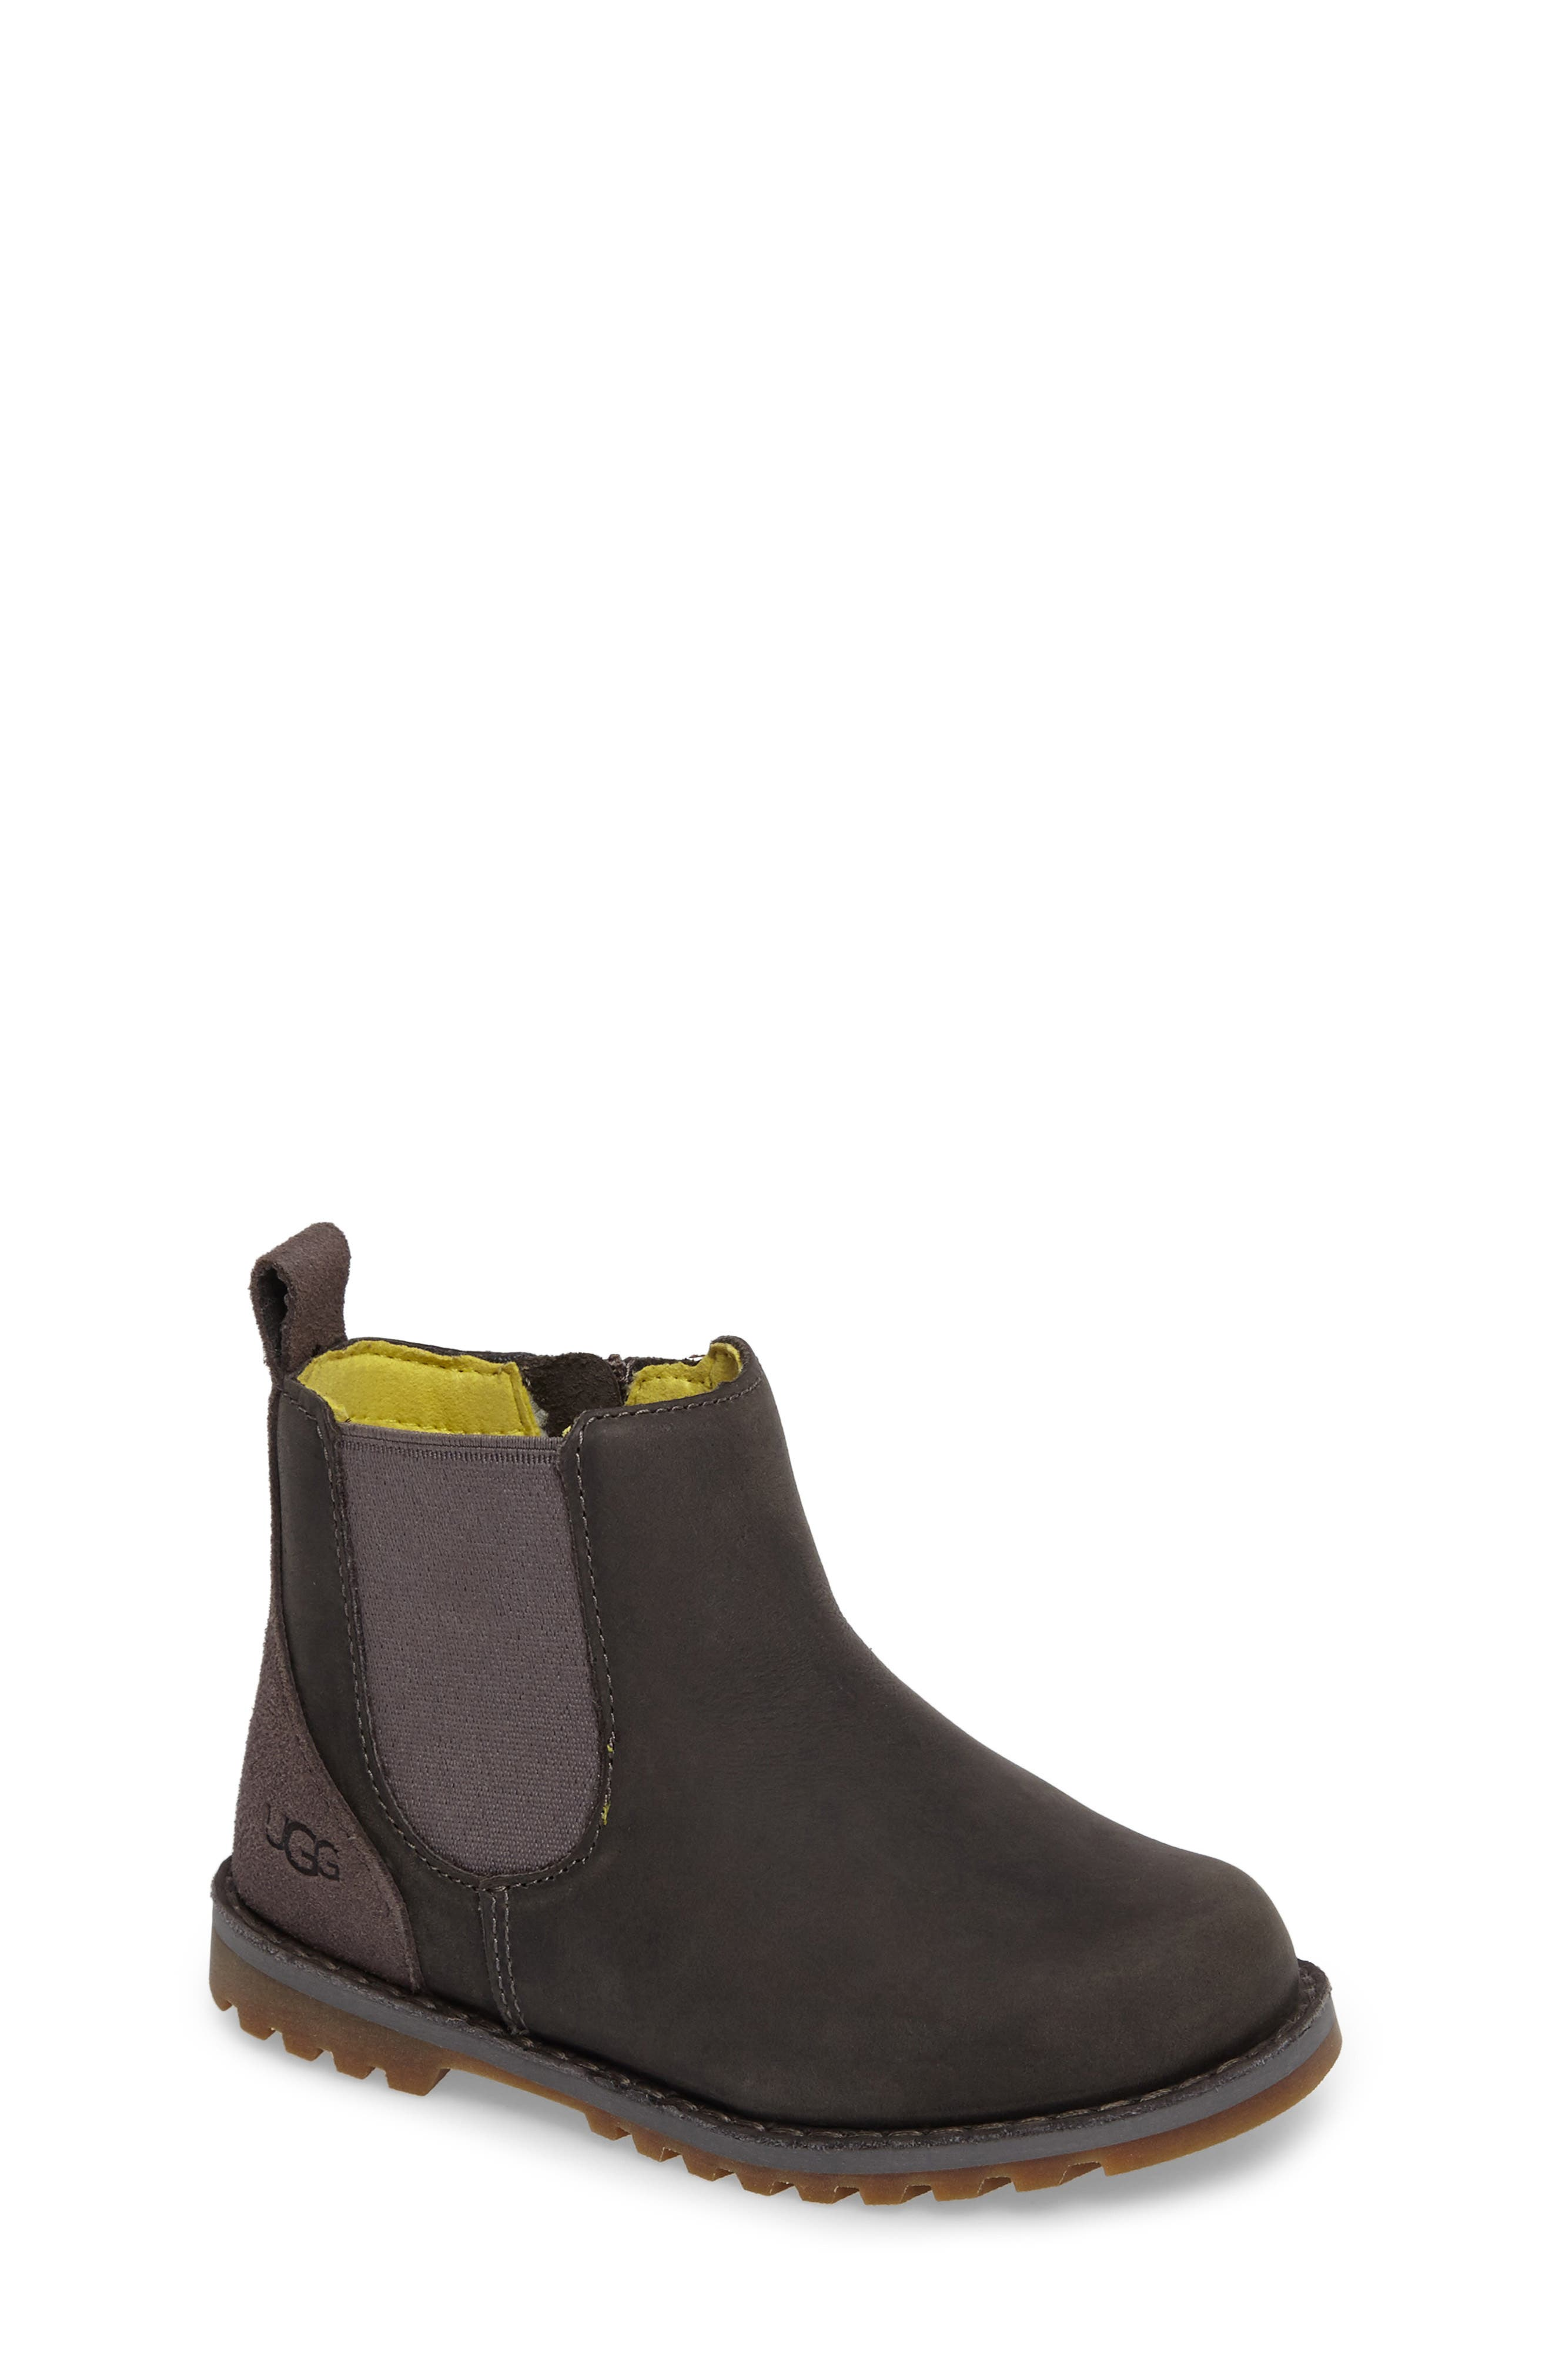 Callum Chelsea Boot,                         Main,                         color, 030